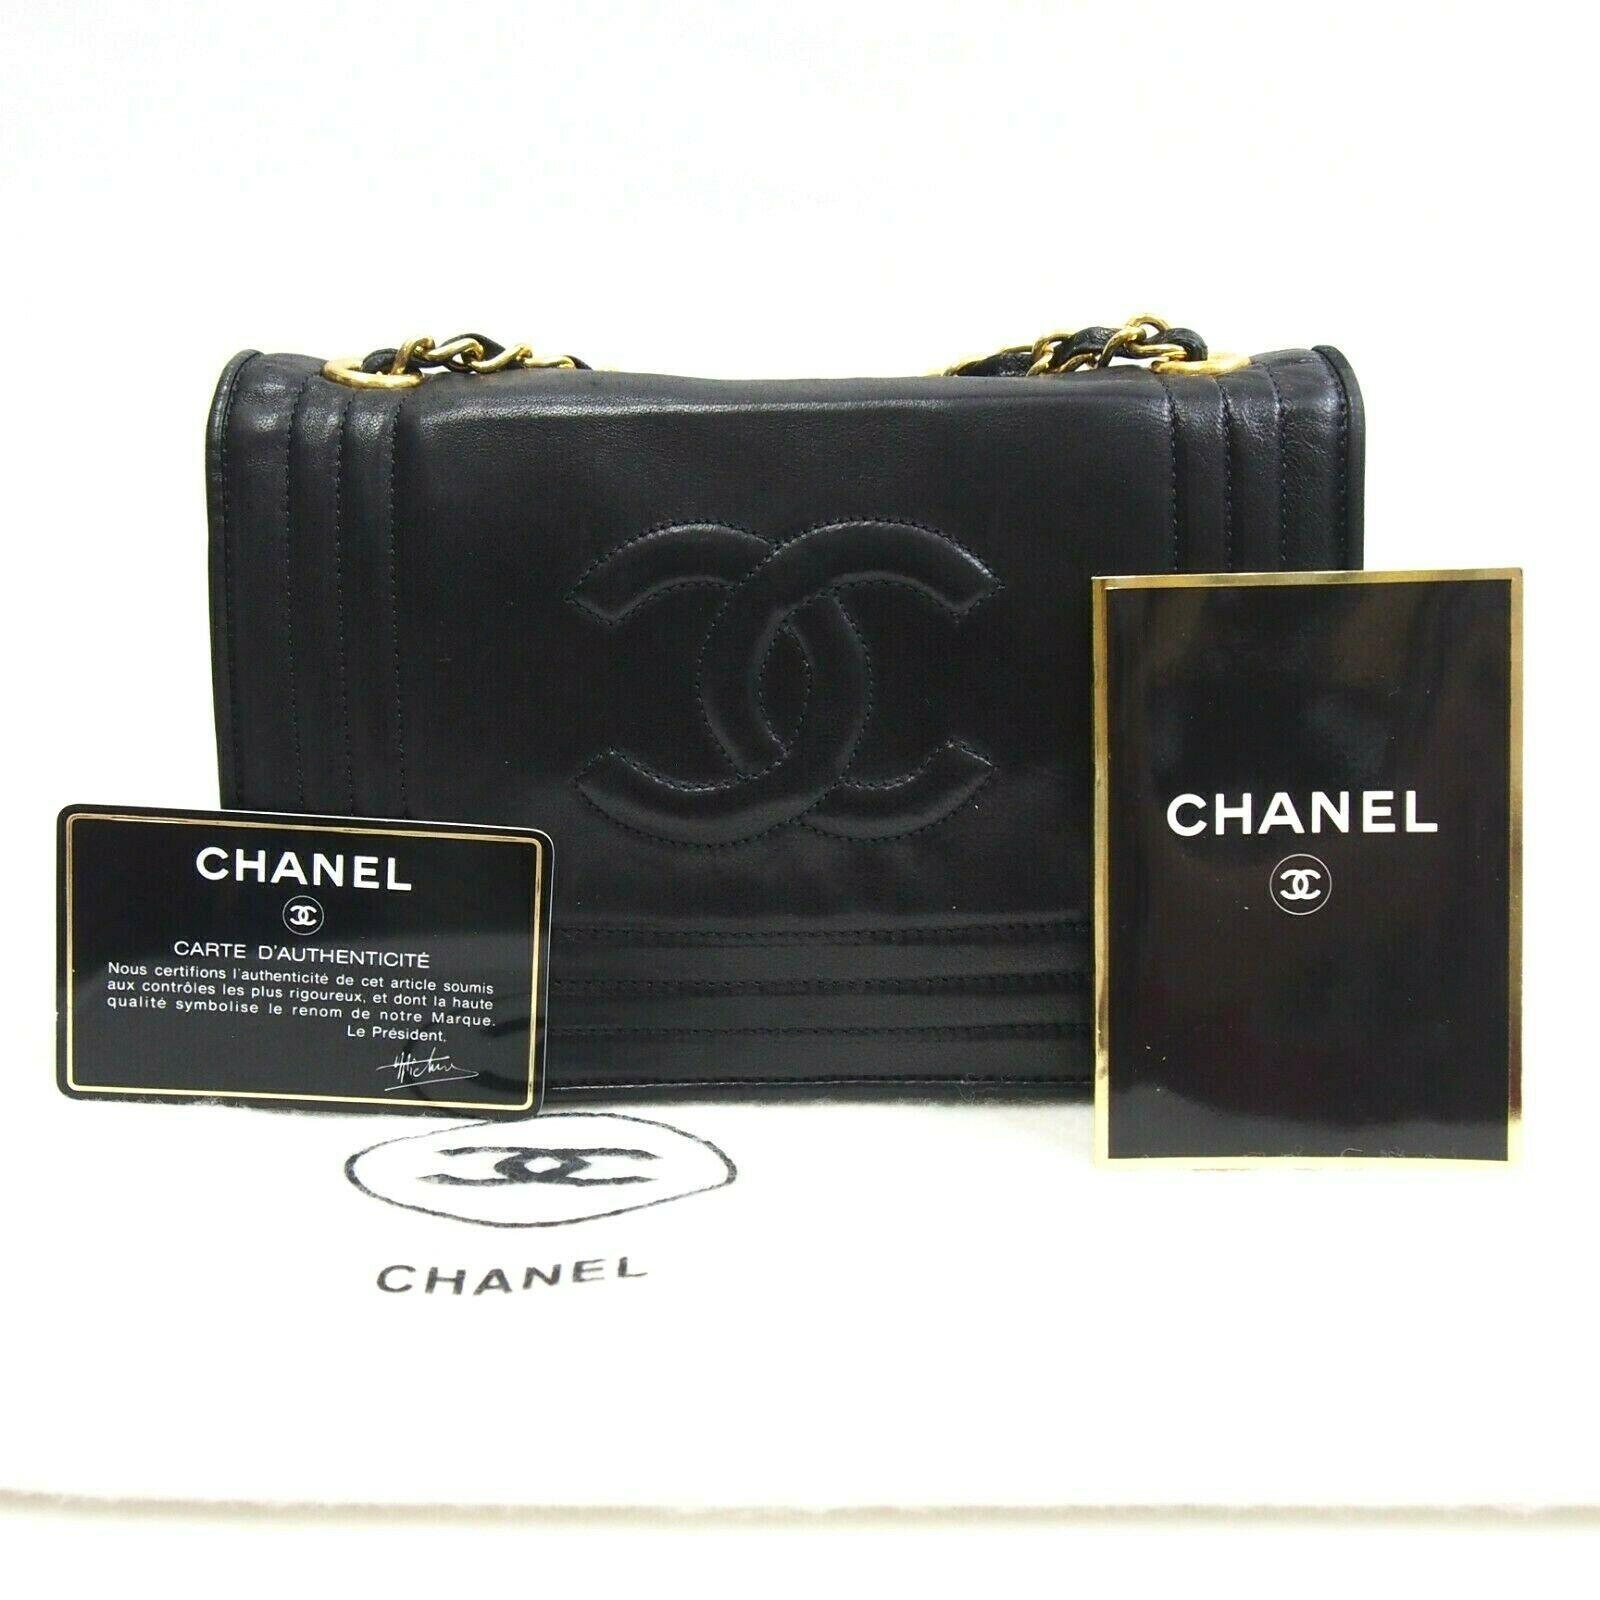 2aa96b145a6a 57. 57. Previous. Auth CHANEL Shoulder Bag Black Mini Matelasse Vintage  Flap Logo Lambskin Z0031. Auth CHANEL ...